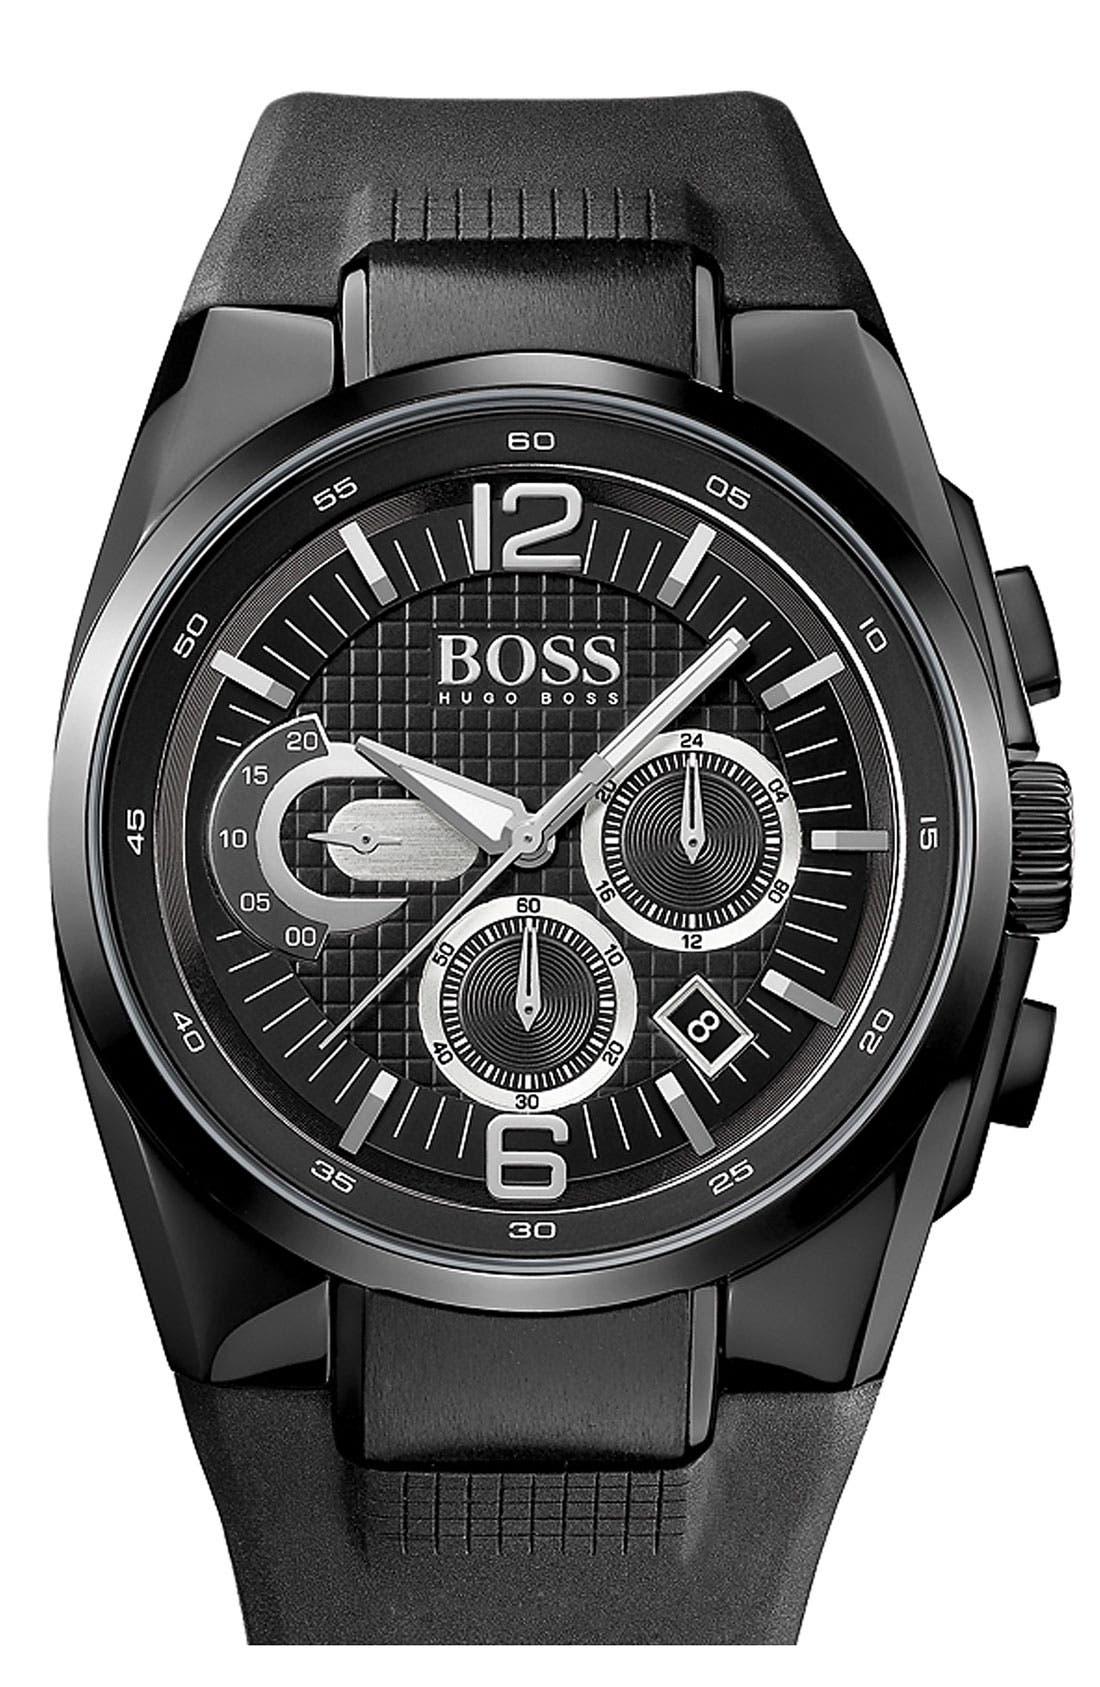 Main Image - BOSS HUGO BOSS 'HB2005' Chronograph Rubber Strap Watch, 44mm